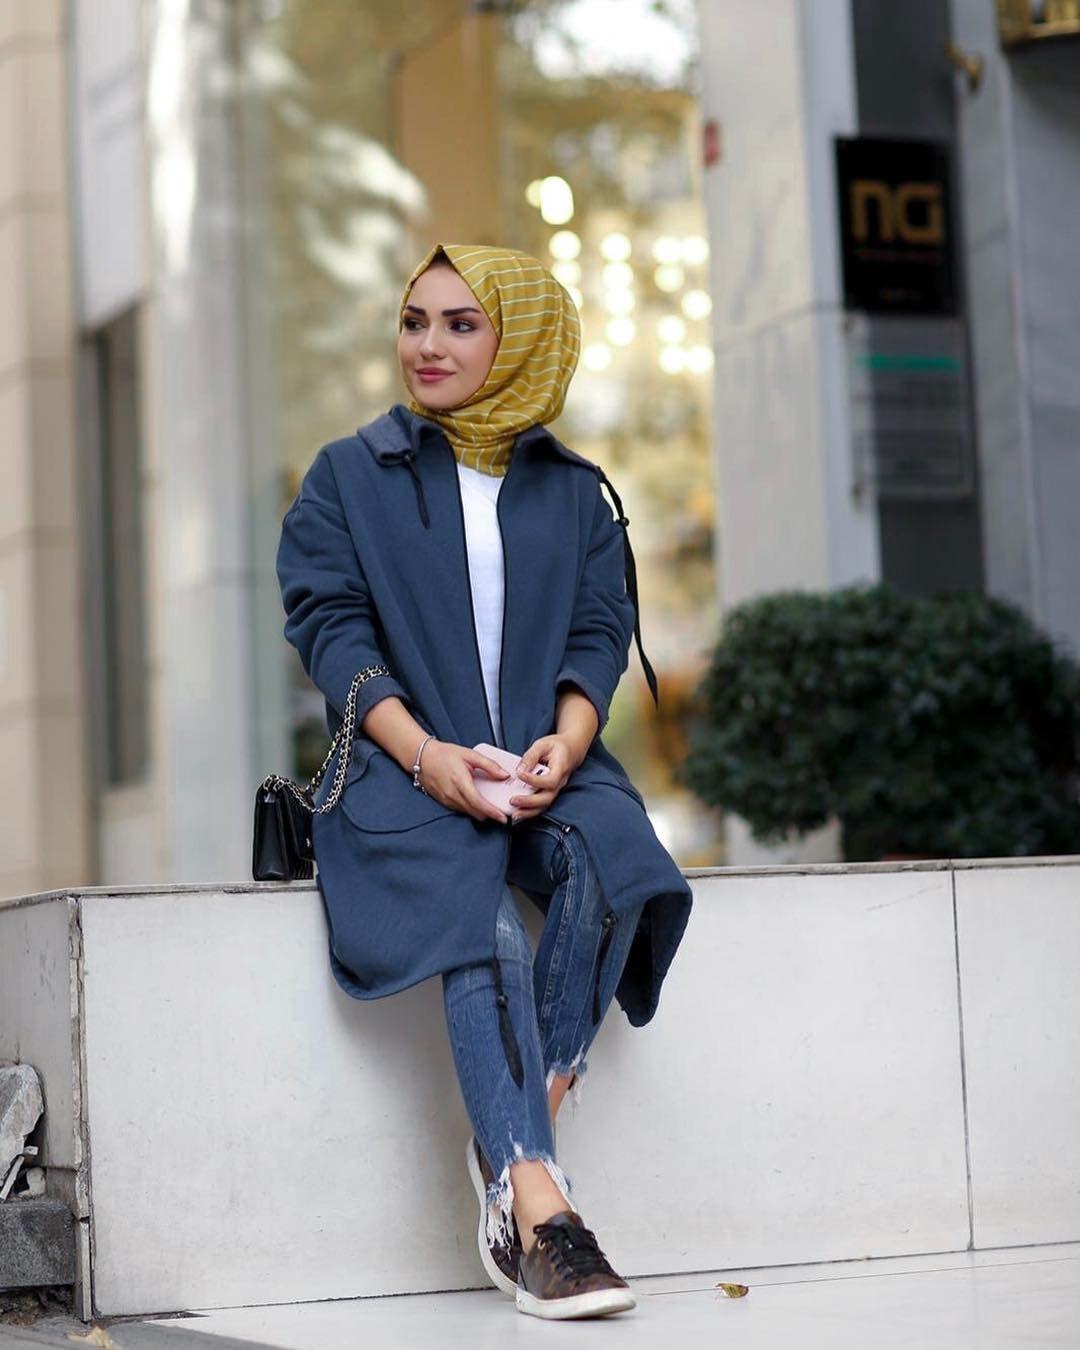 Photo of hijab and burka